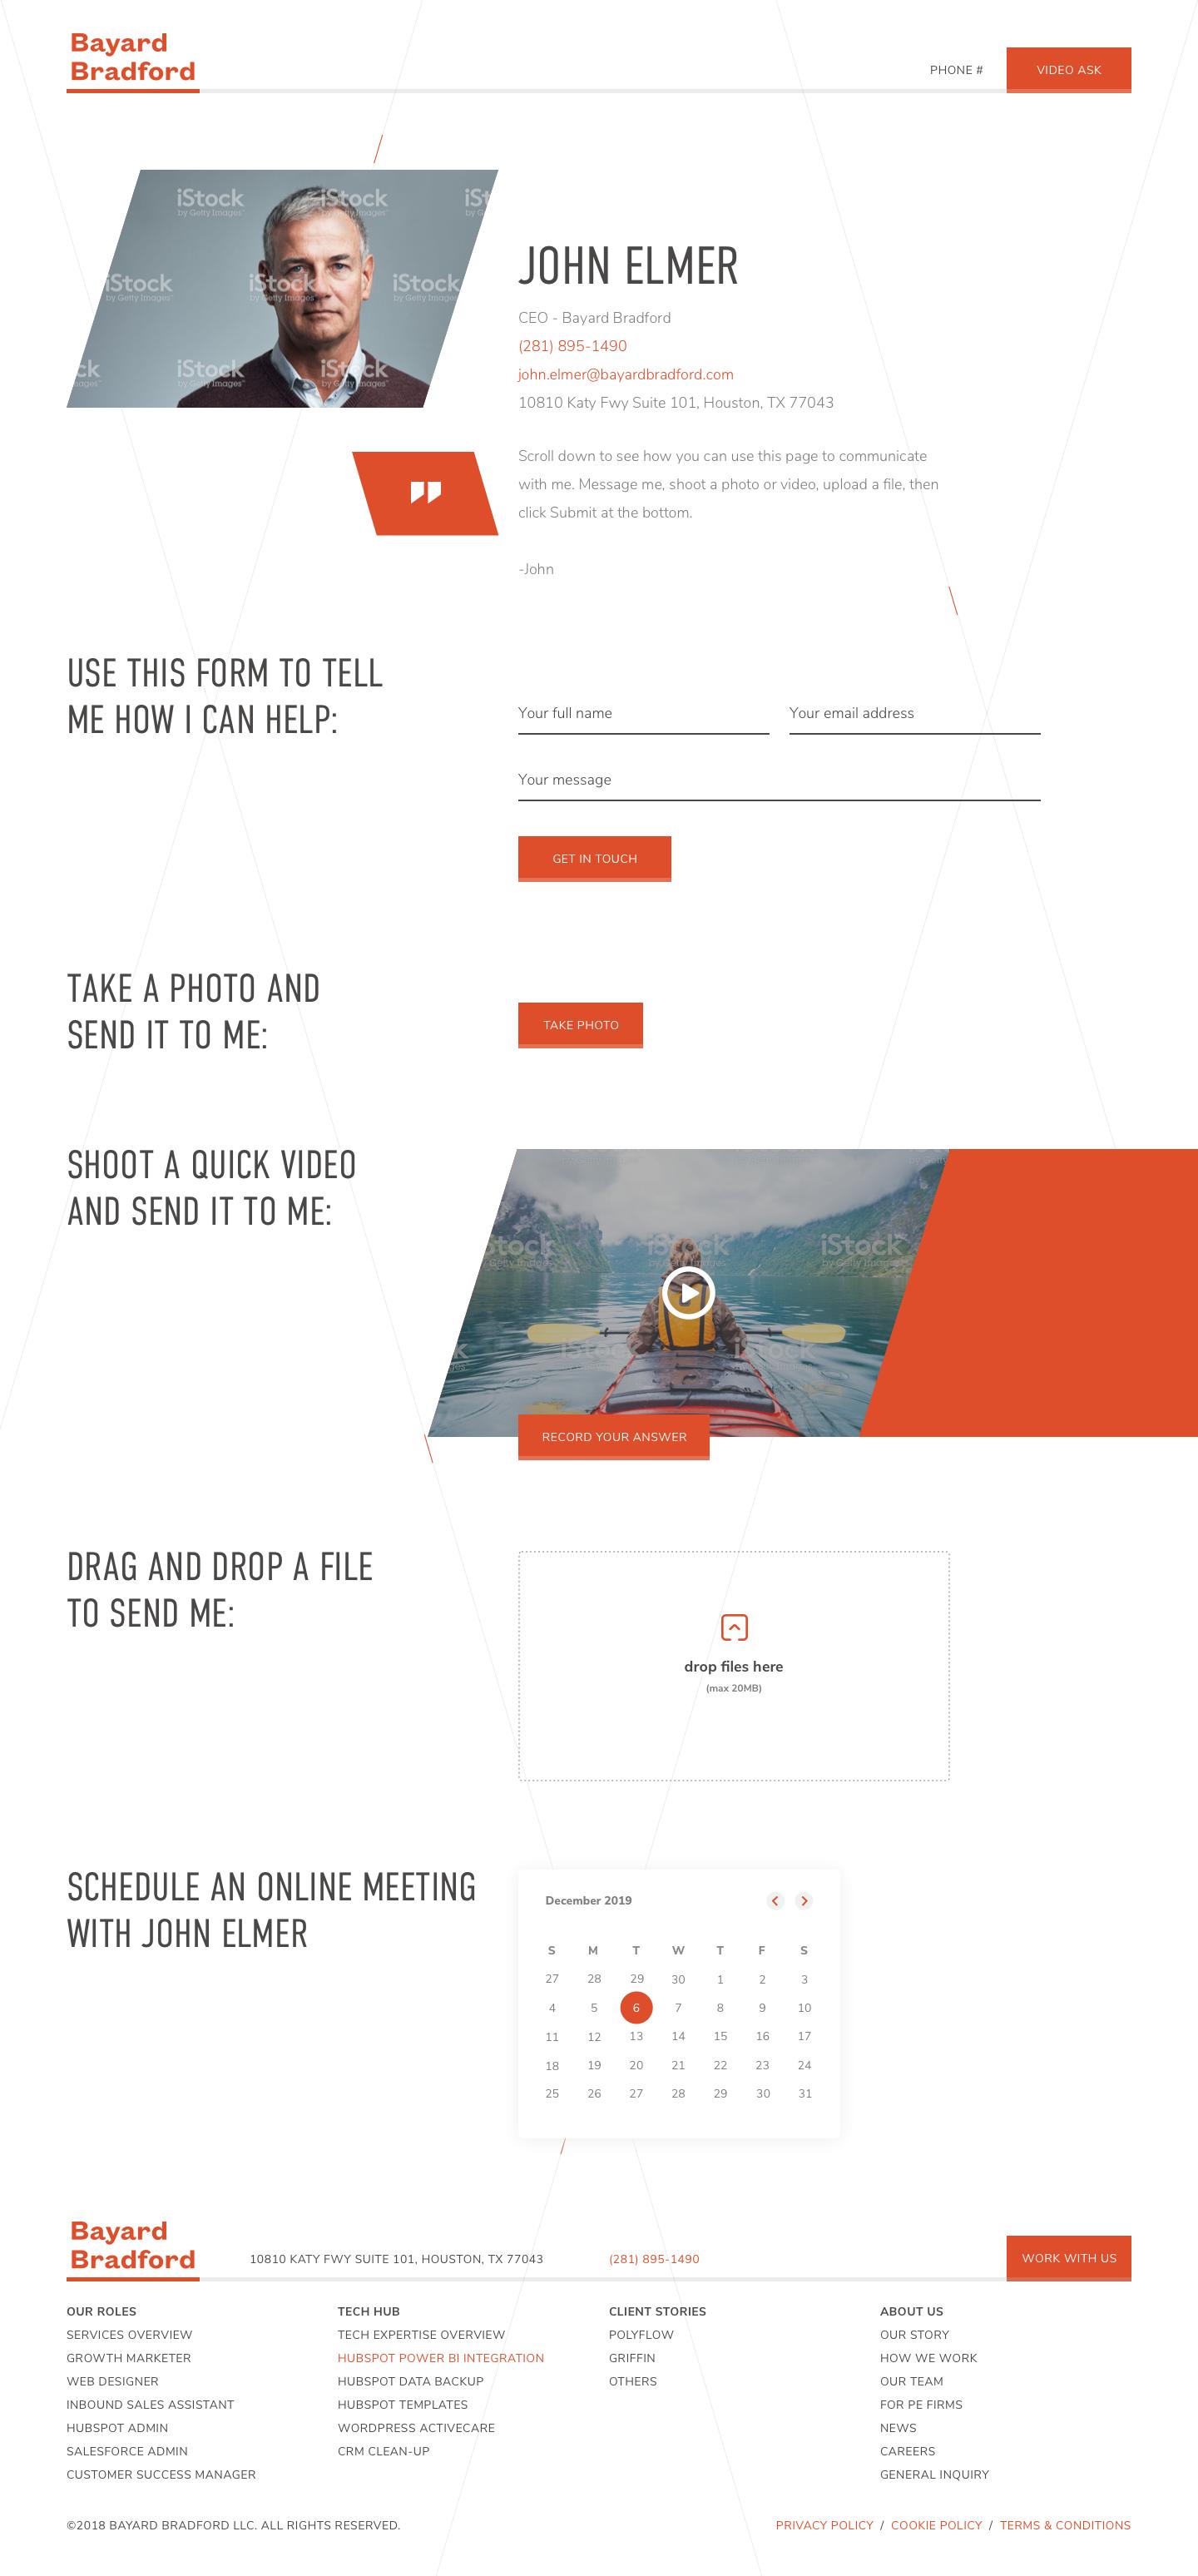 Bayard - White Label - Salesperson Profile Page